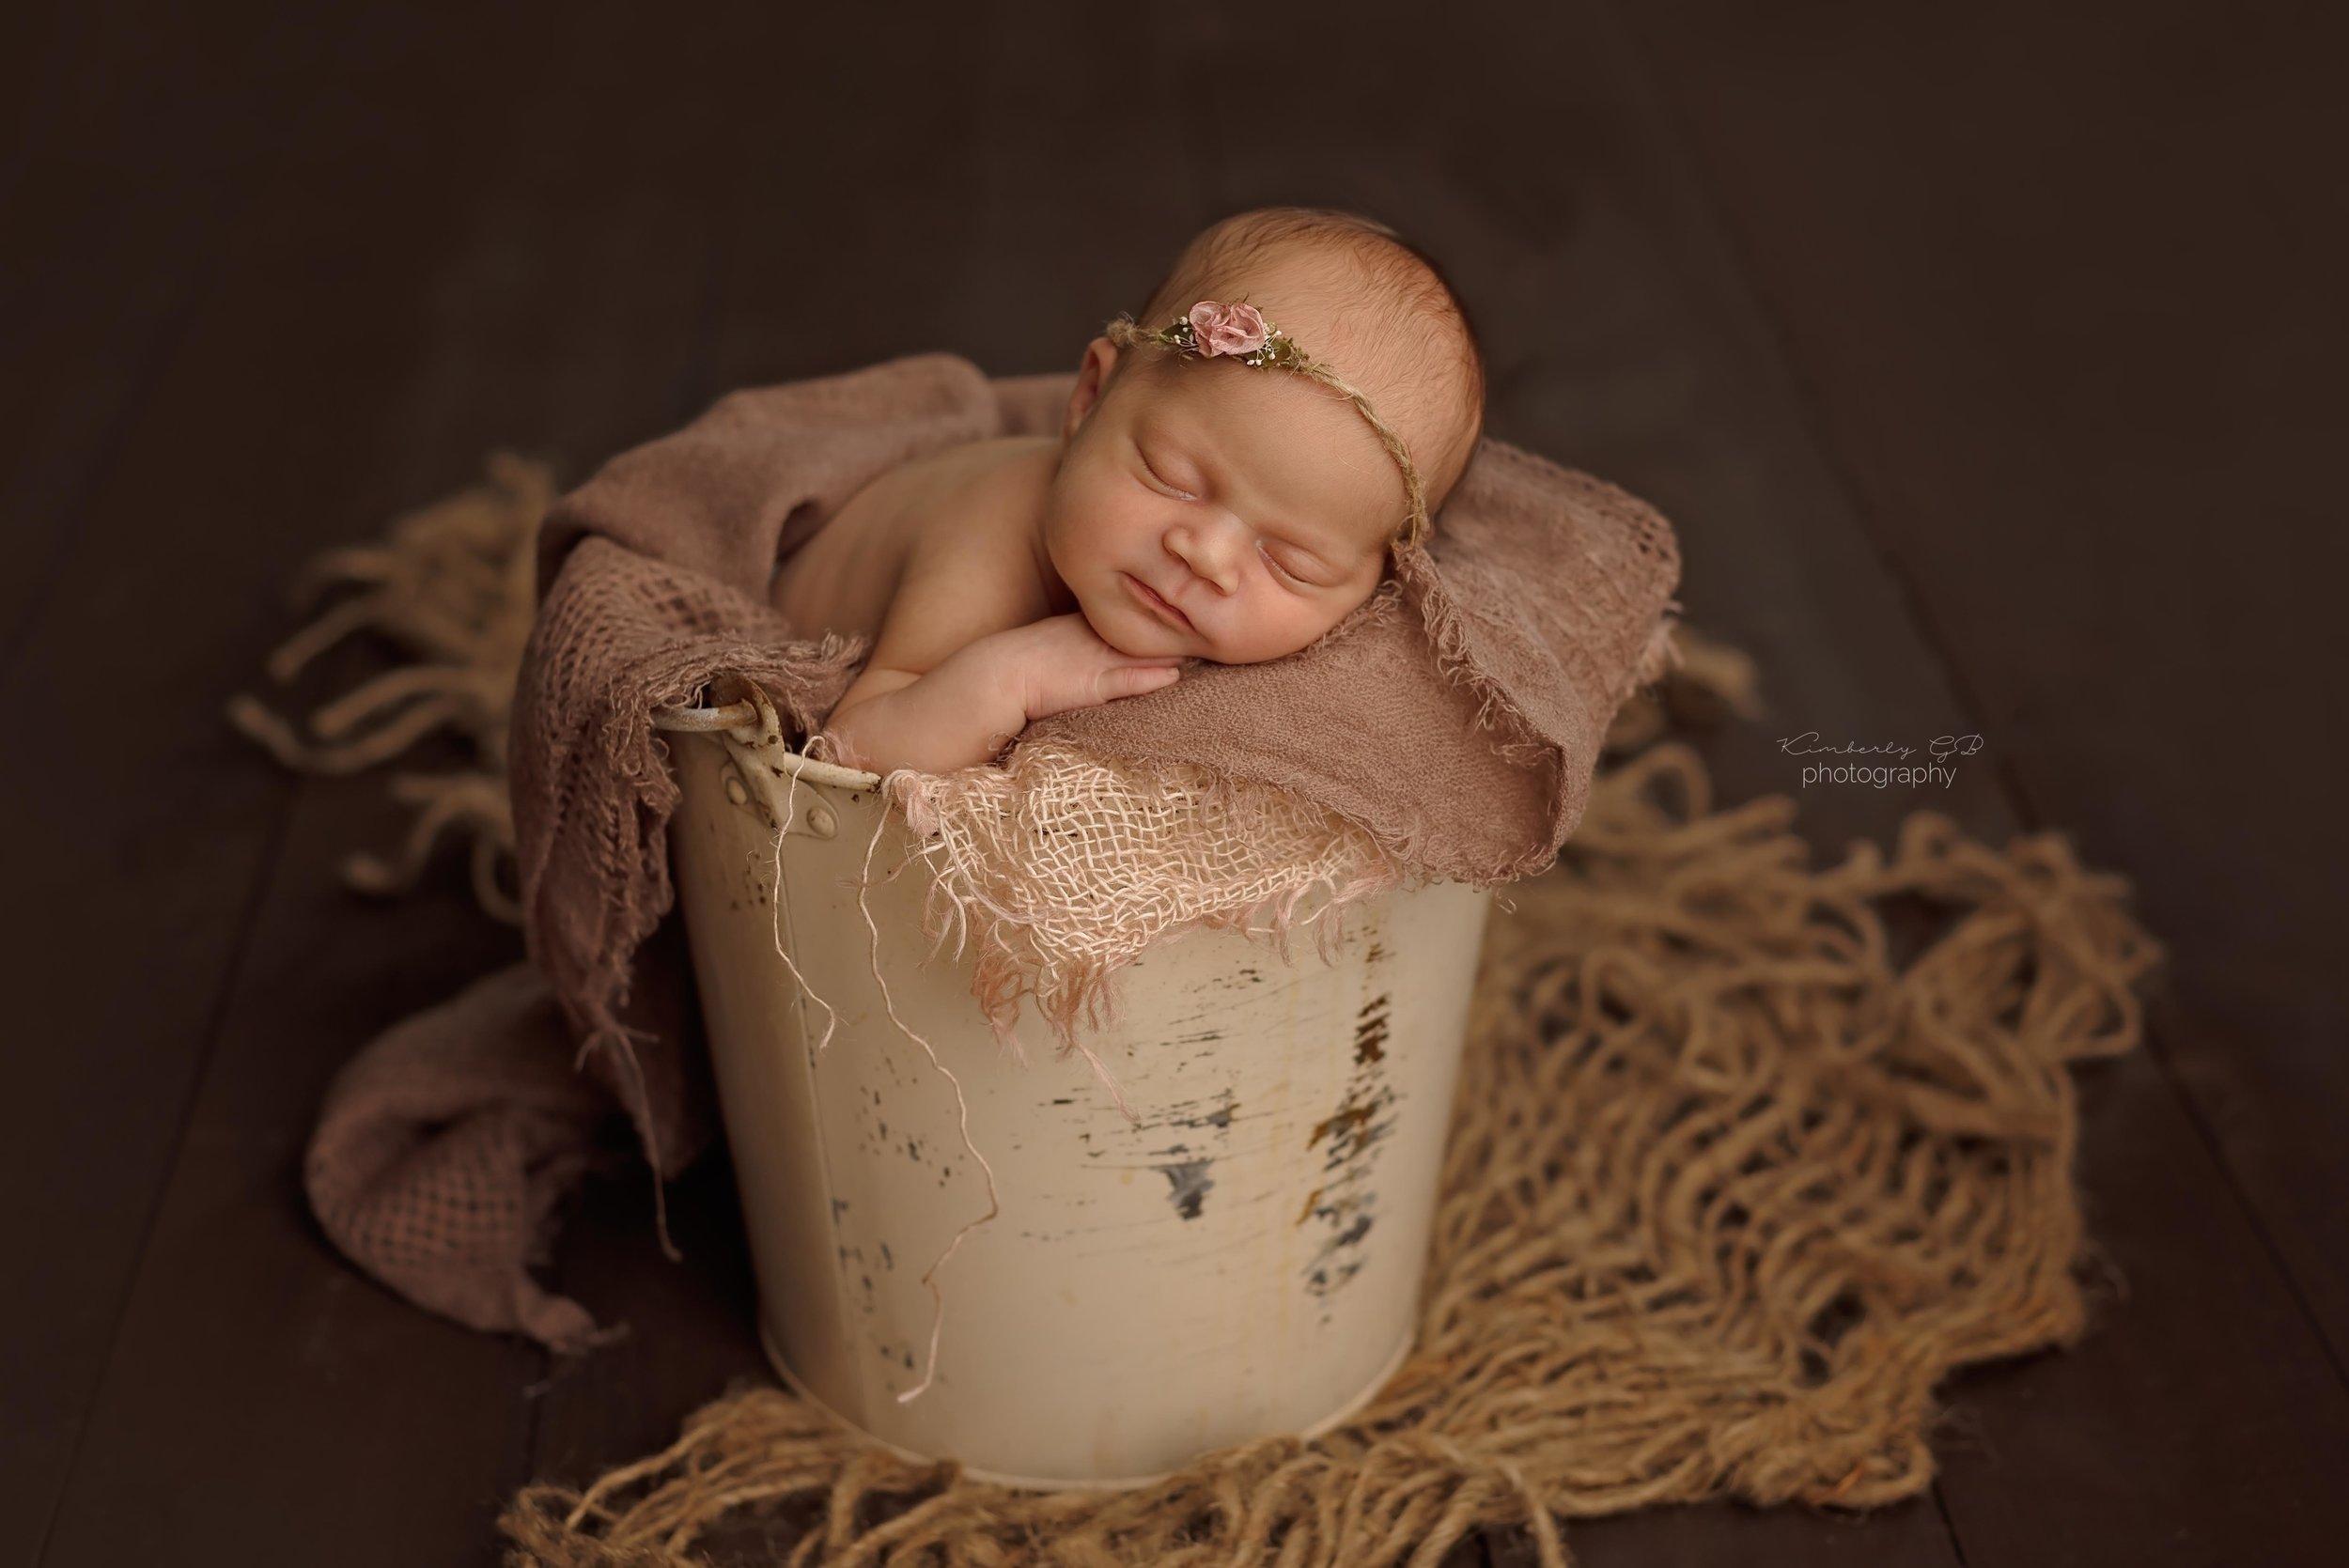 fotografia-de-recien-nacidos-bebes-newborn-en-puerto-rico-kimberly-gb-photography-fotografa-157.jpg